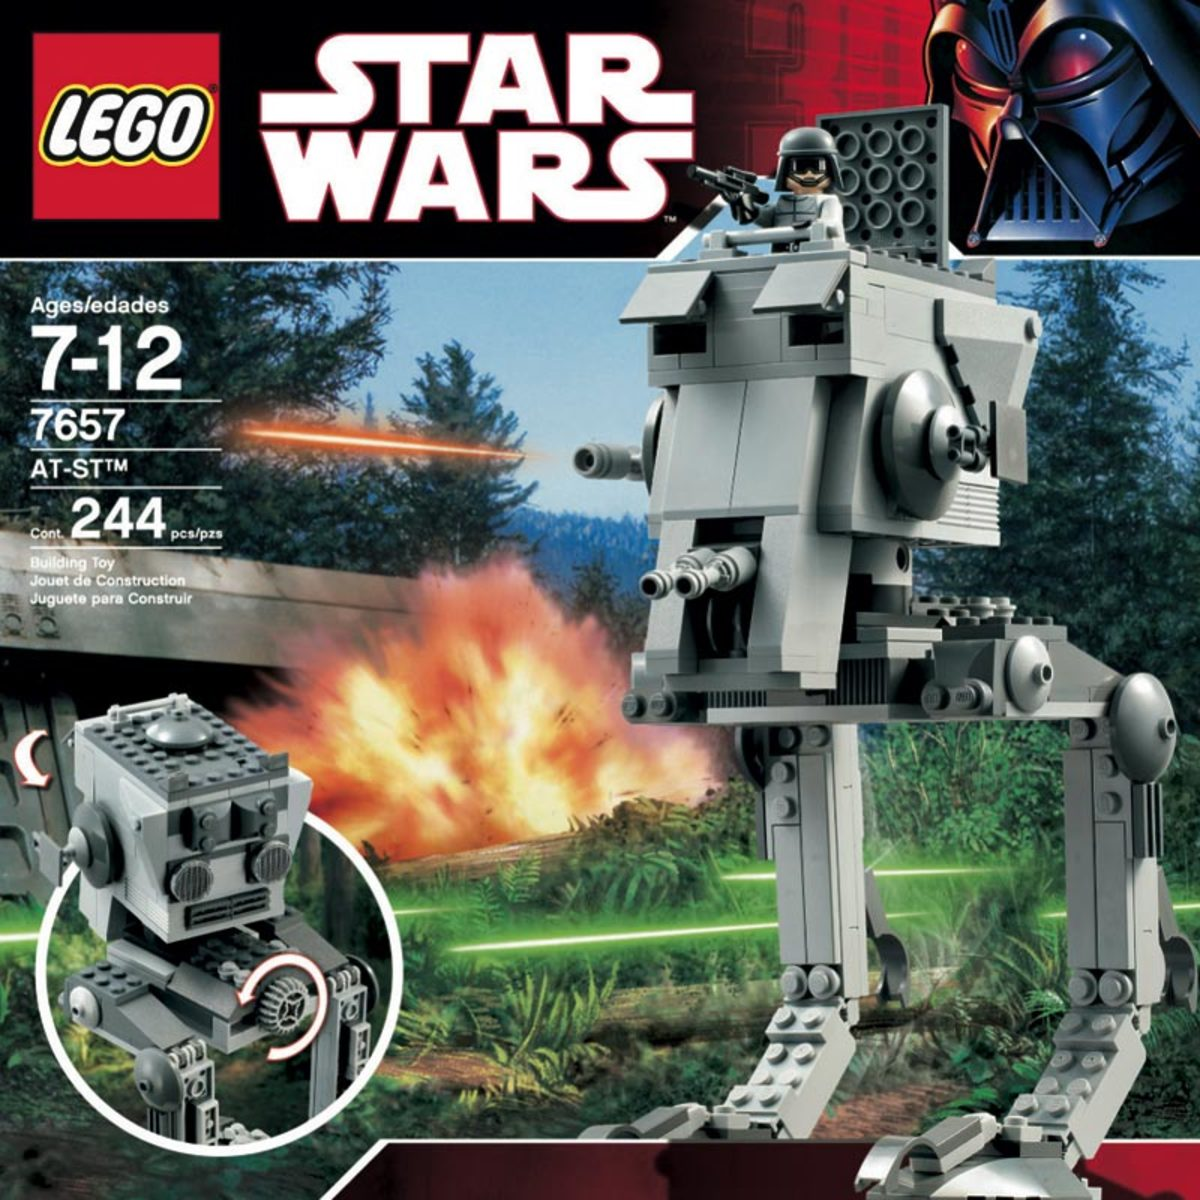 Lego Star Wars 2007 Hubpages 7665 Republic Cruiser